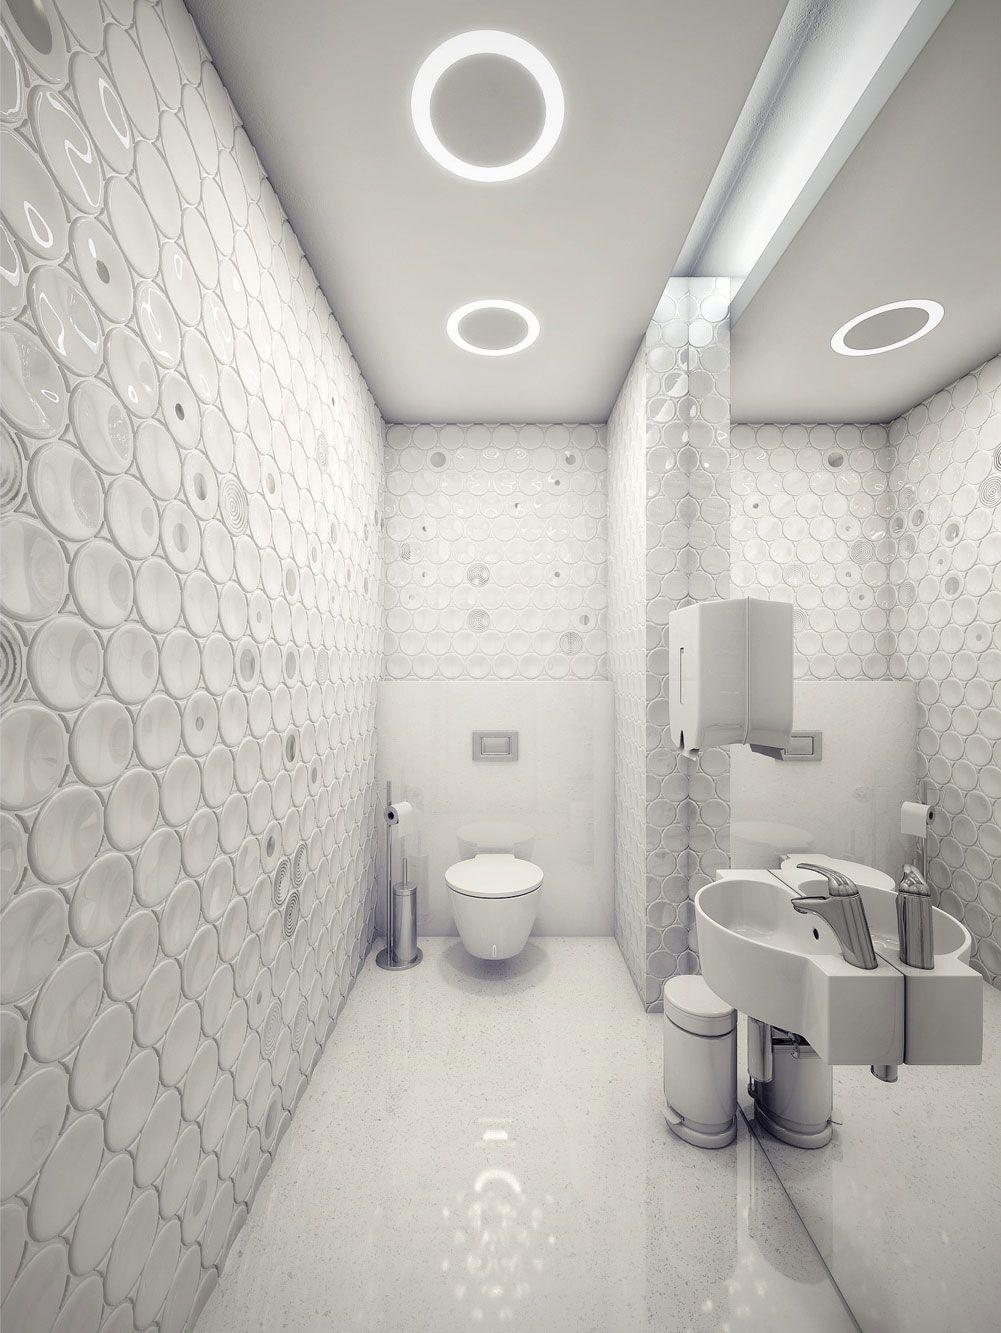 Amazing Surgery Clinic Interiors by Geometrix Design | Clinic ...